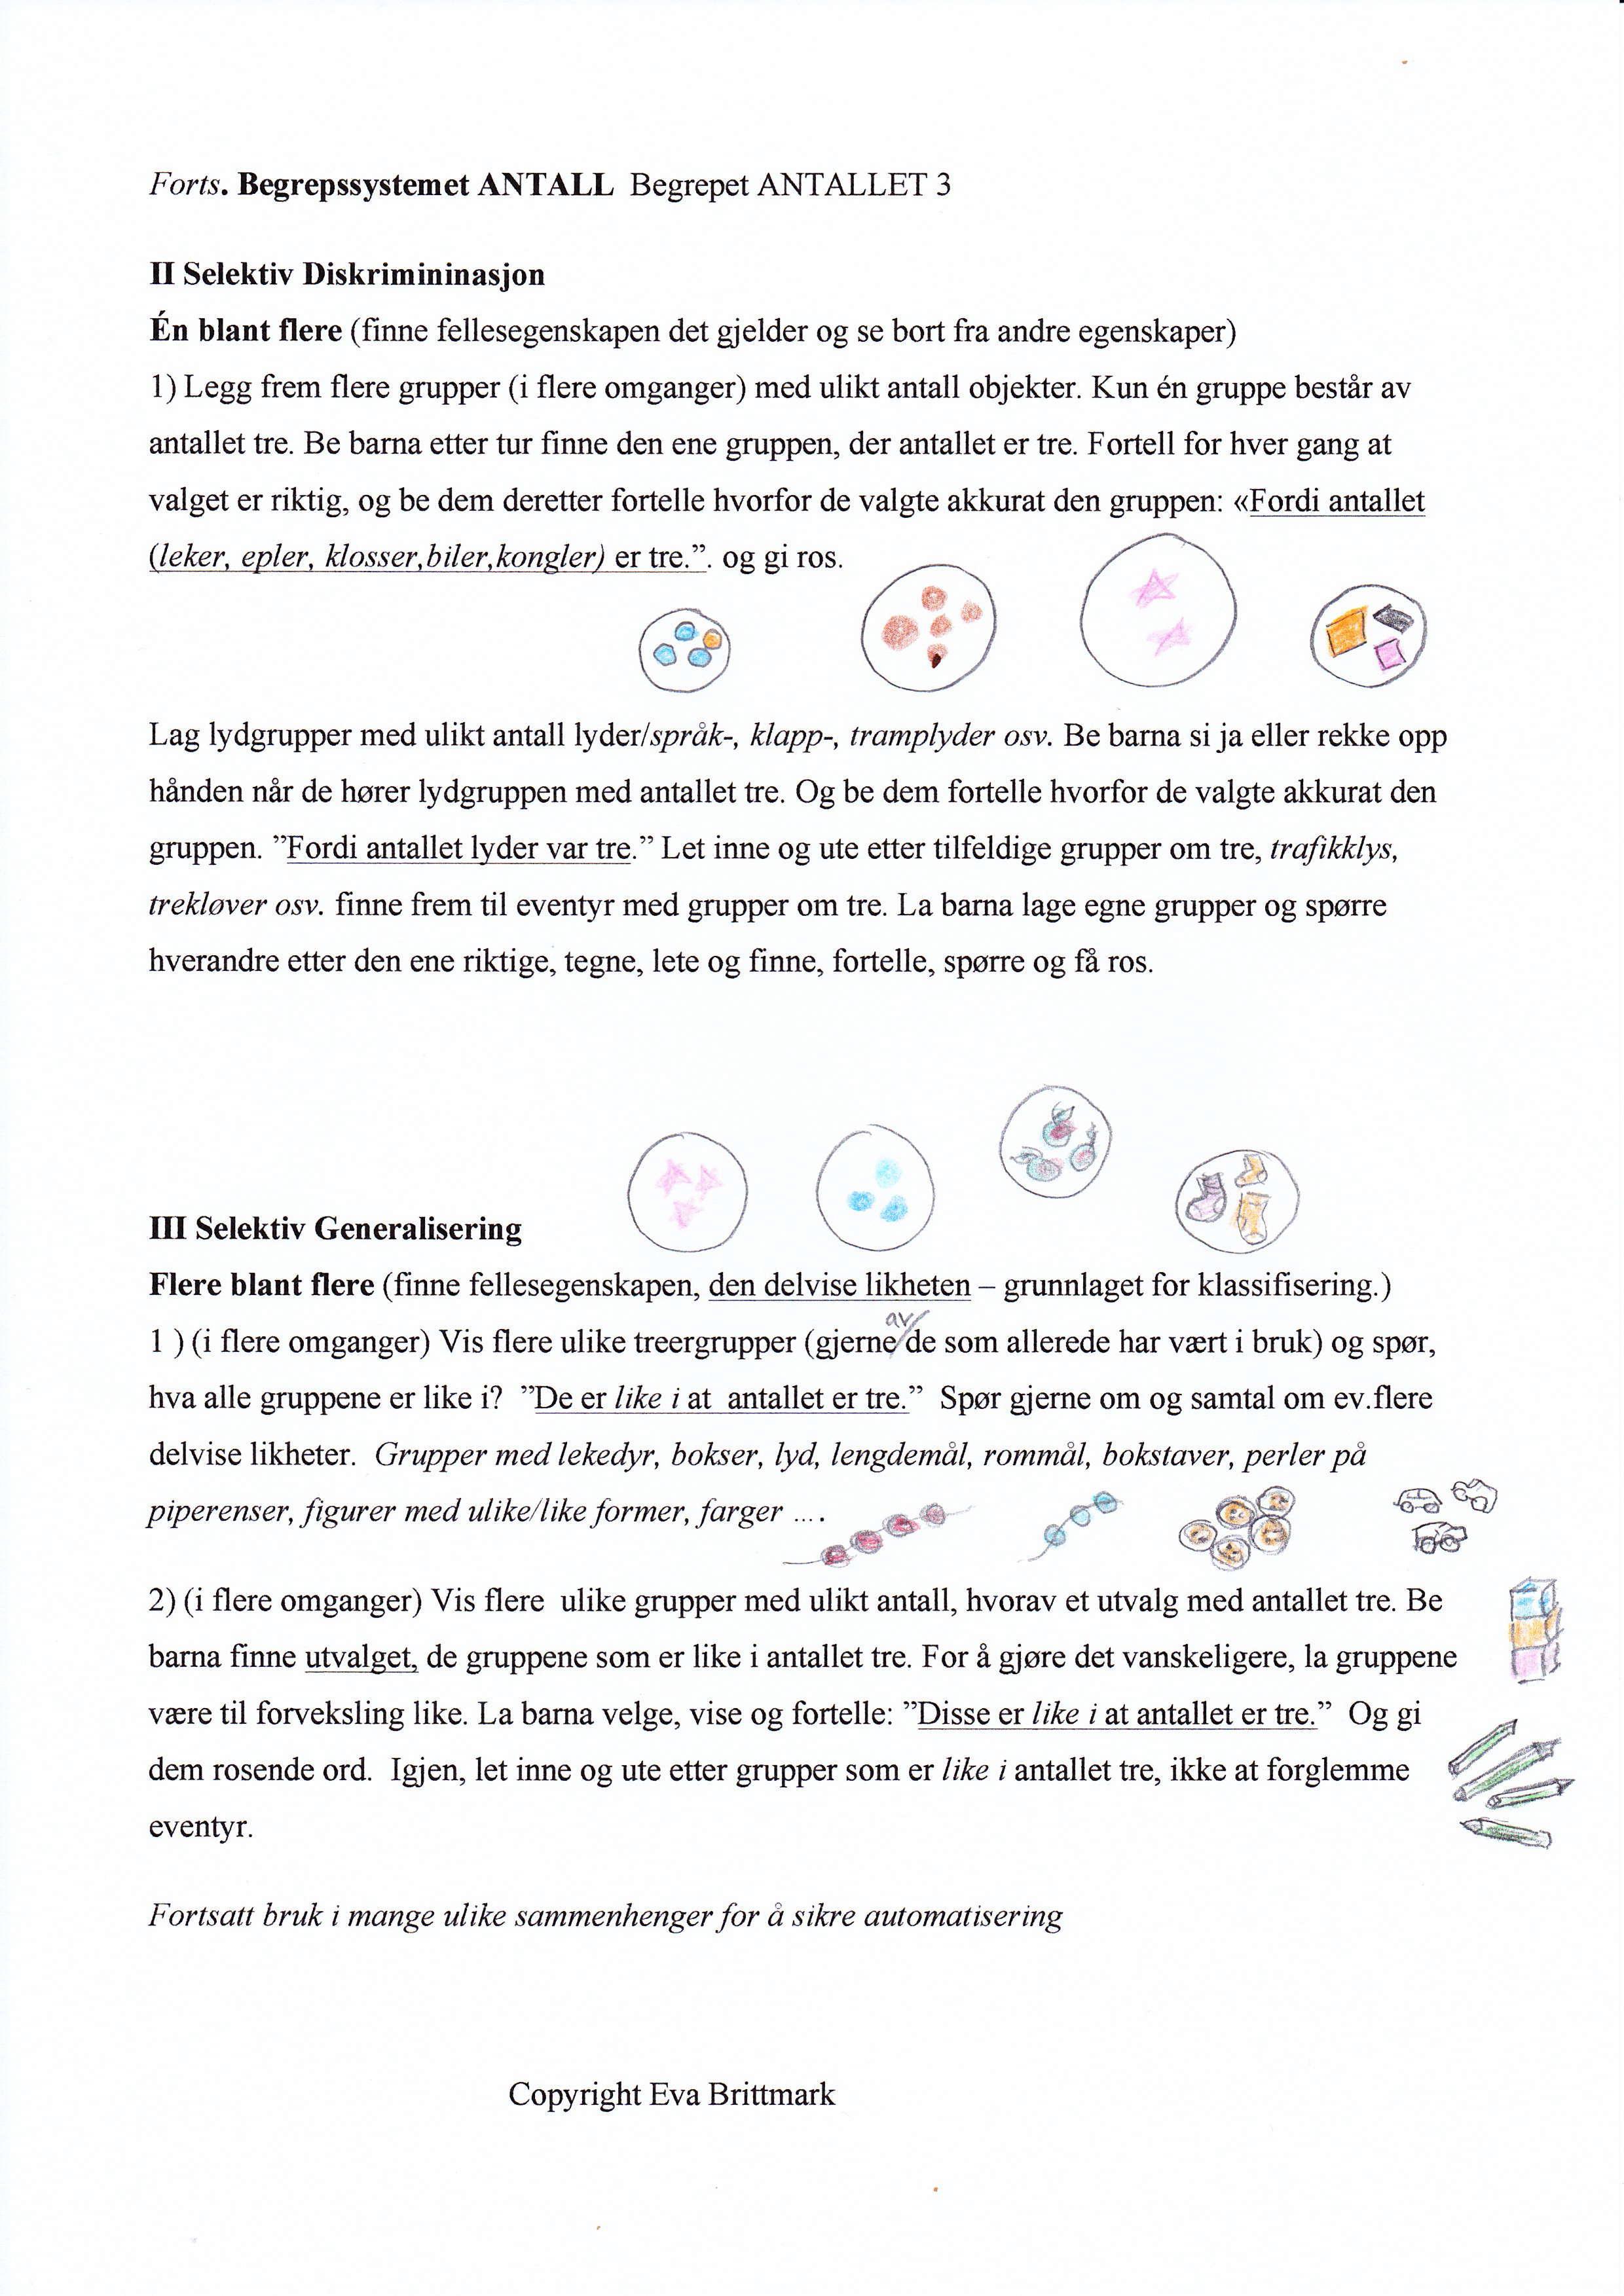 scanned document 3.jpg